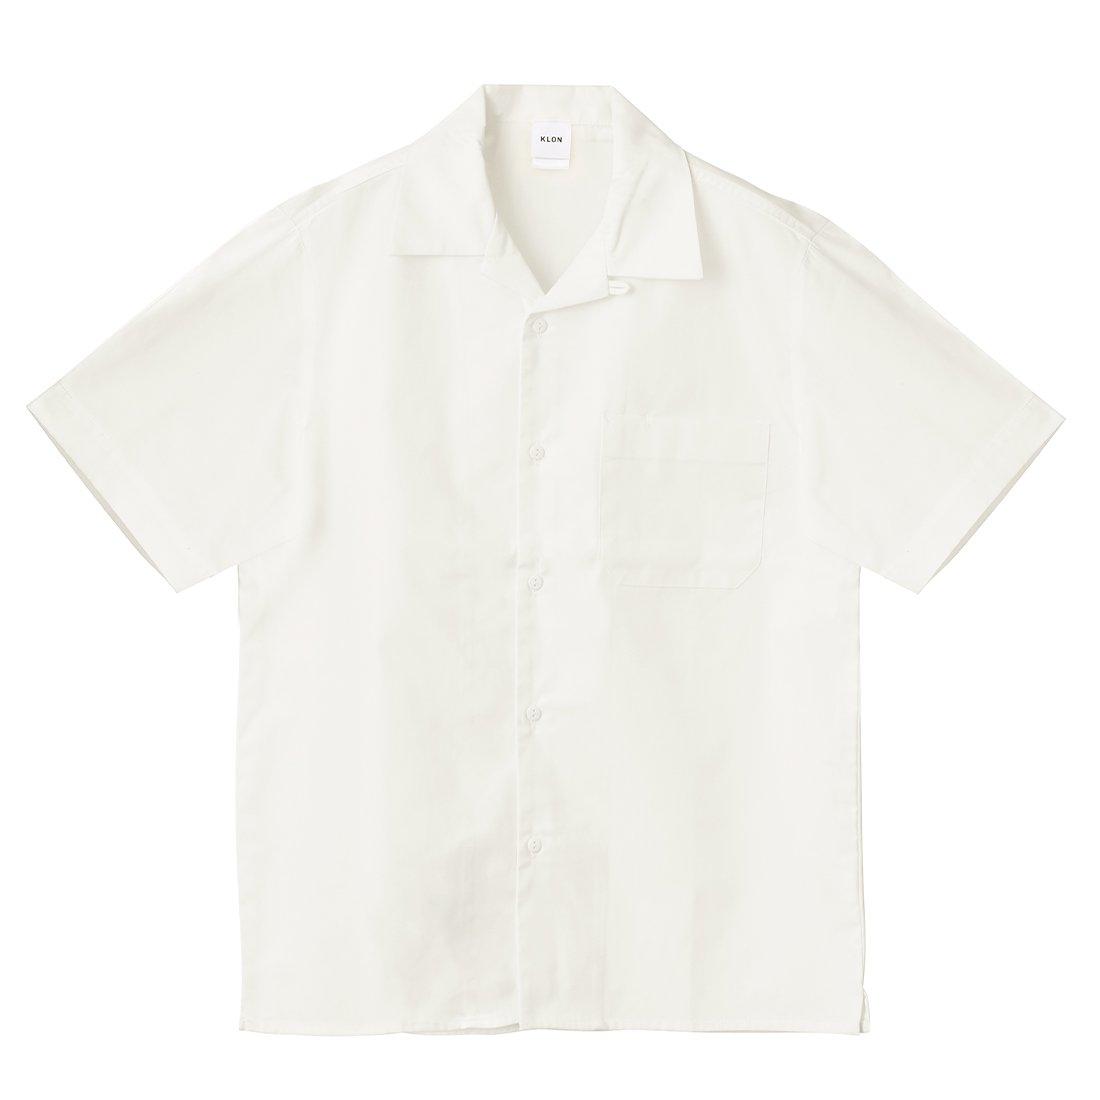 KLON WORX SHORT-SLEEVE SHIRTS WHITE